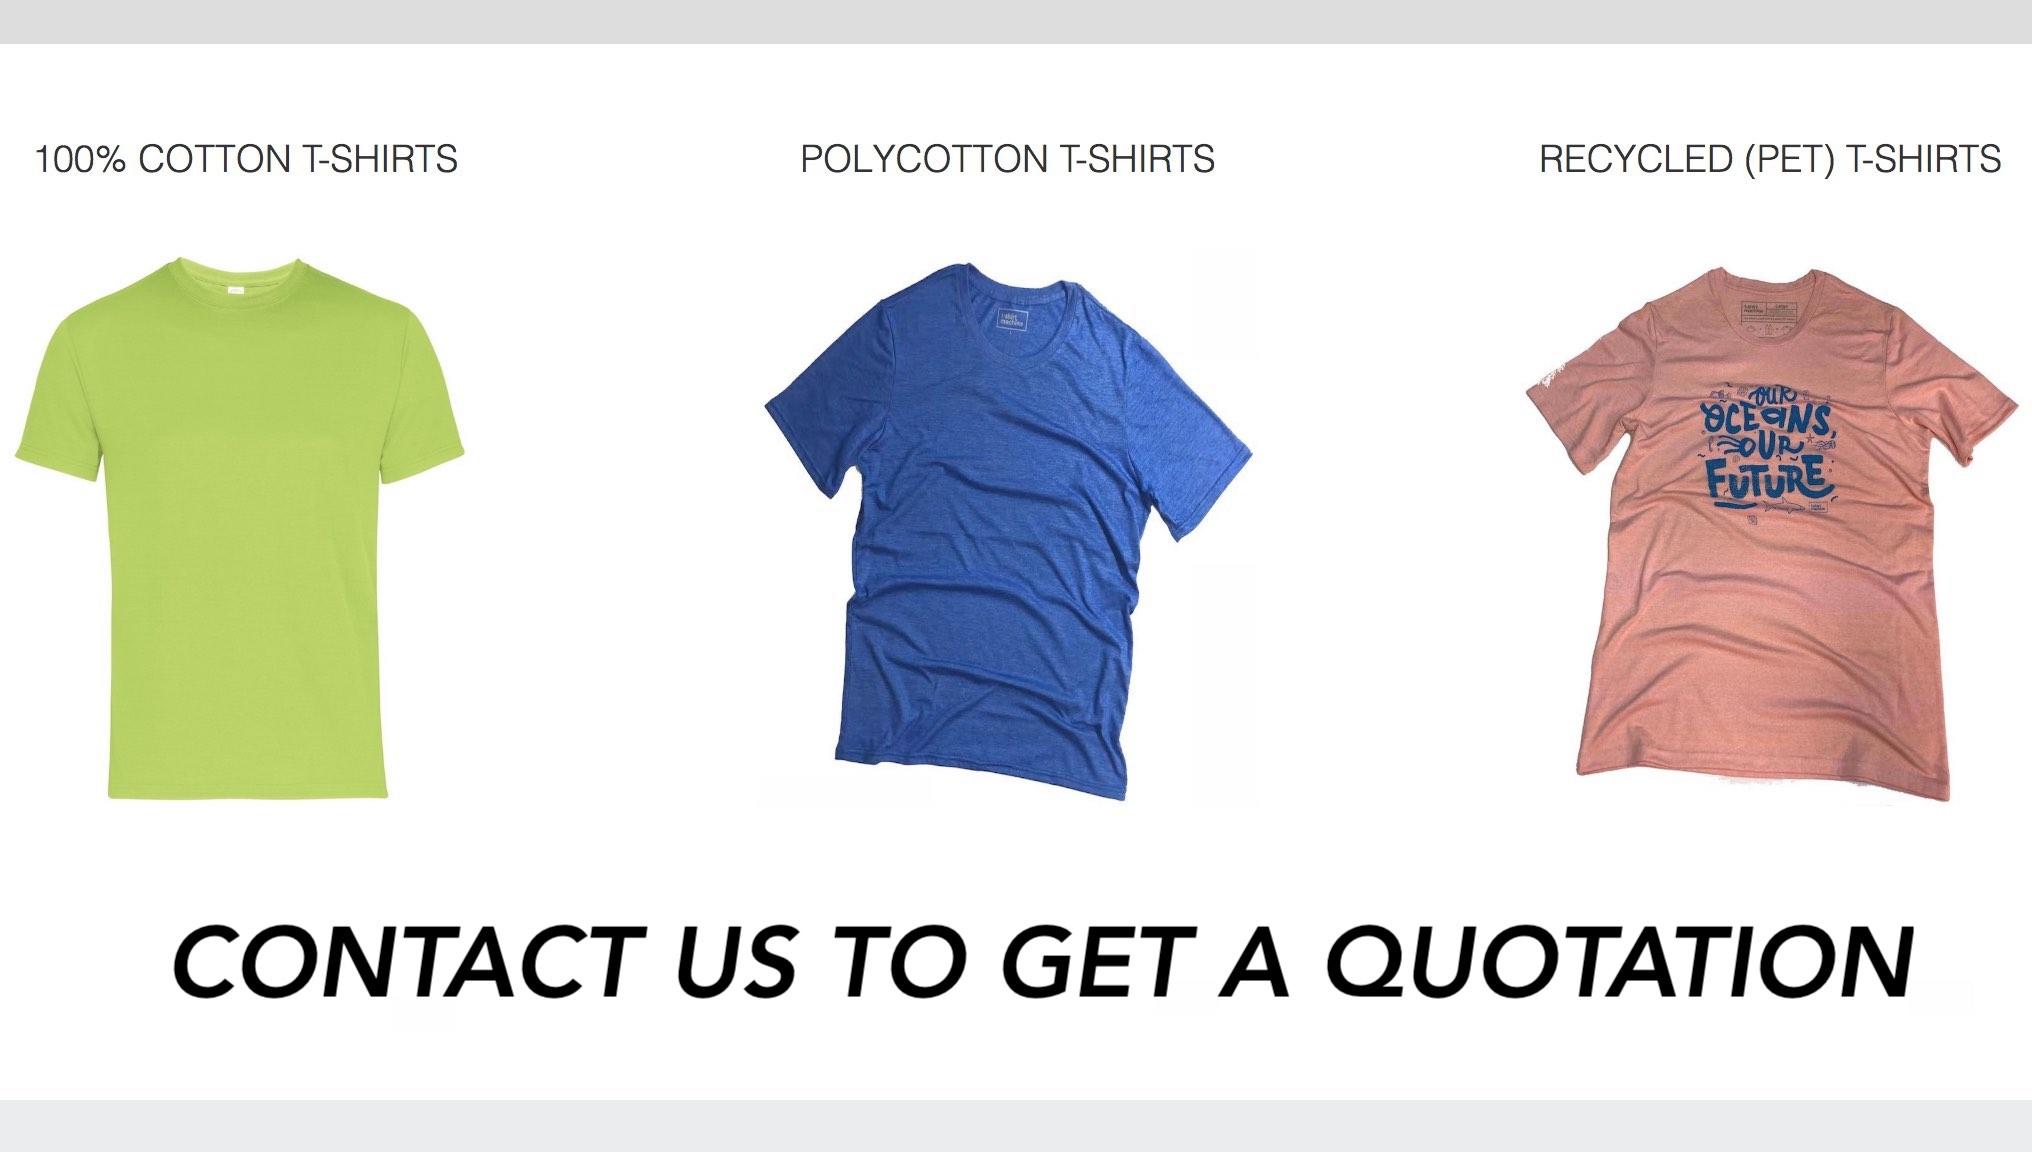 12f59eddb6f8 T-Shirts, Caps, Corporate Clothing, Corporate Gifts, Golf Shirts - T ...